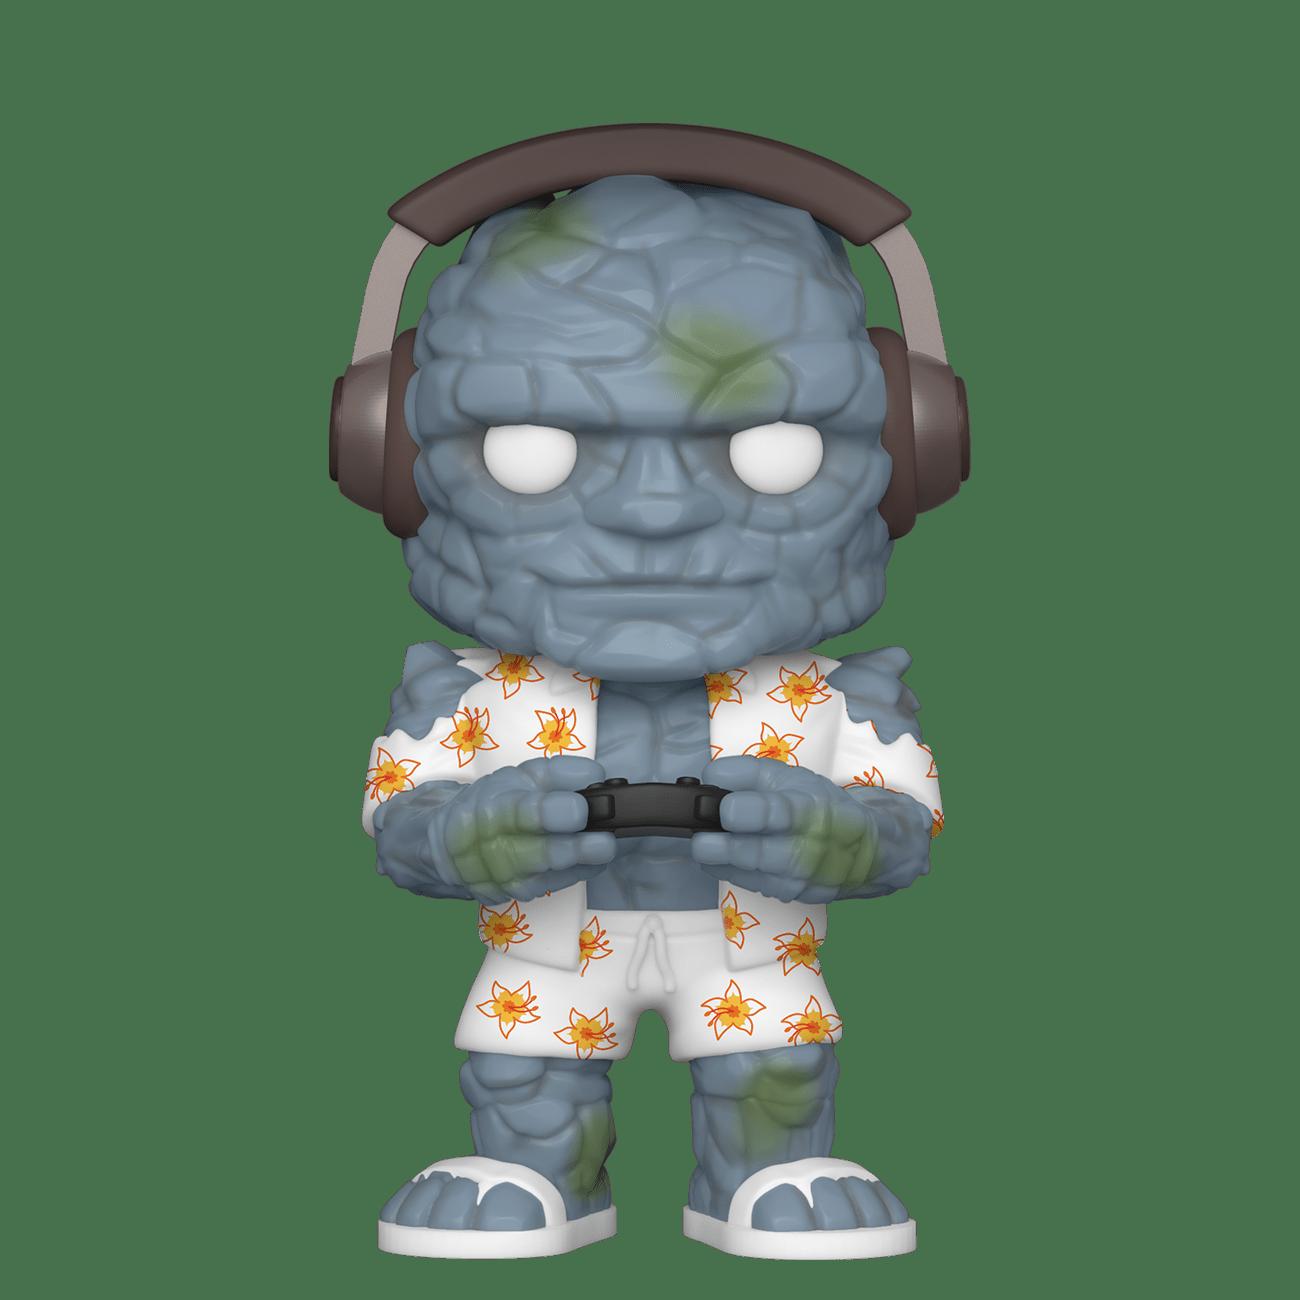 Funko Marvel Endgame Korg with Headhones Funko Pop! Figure